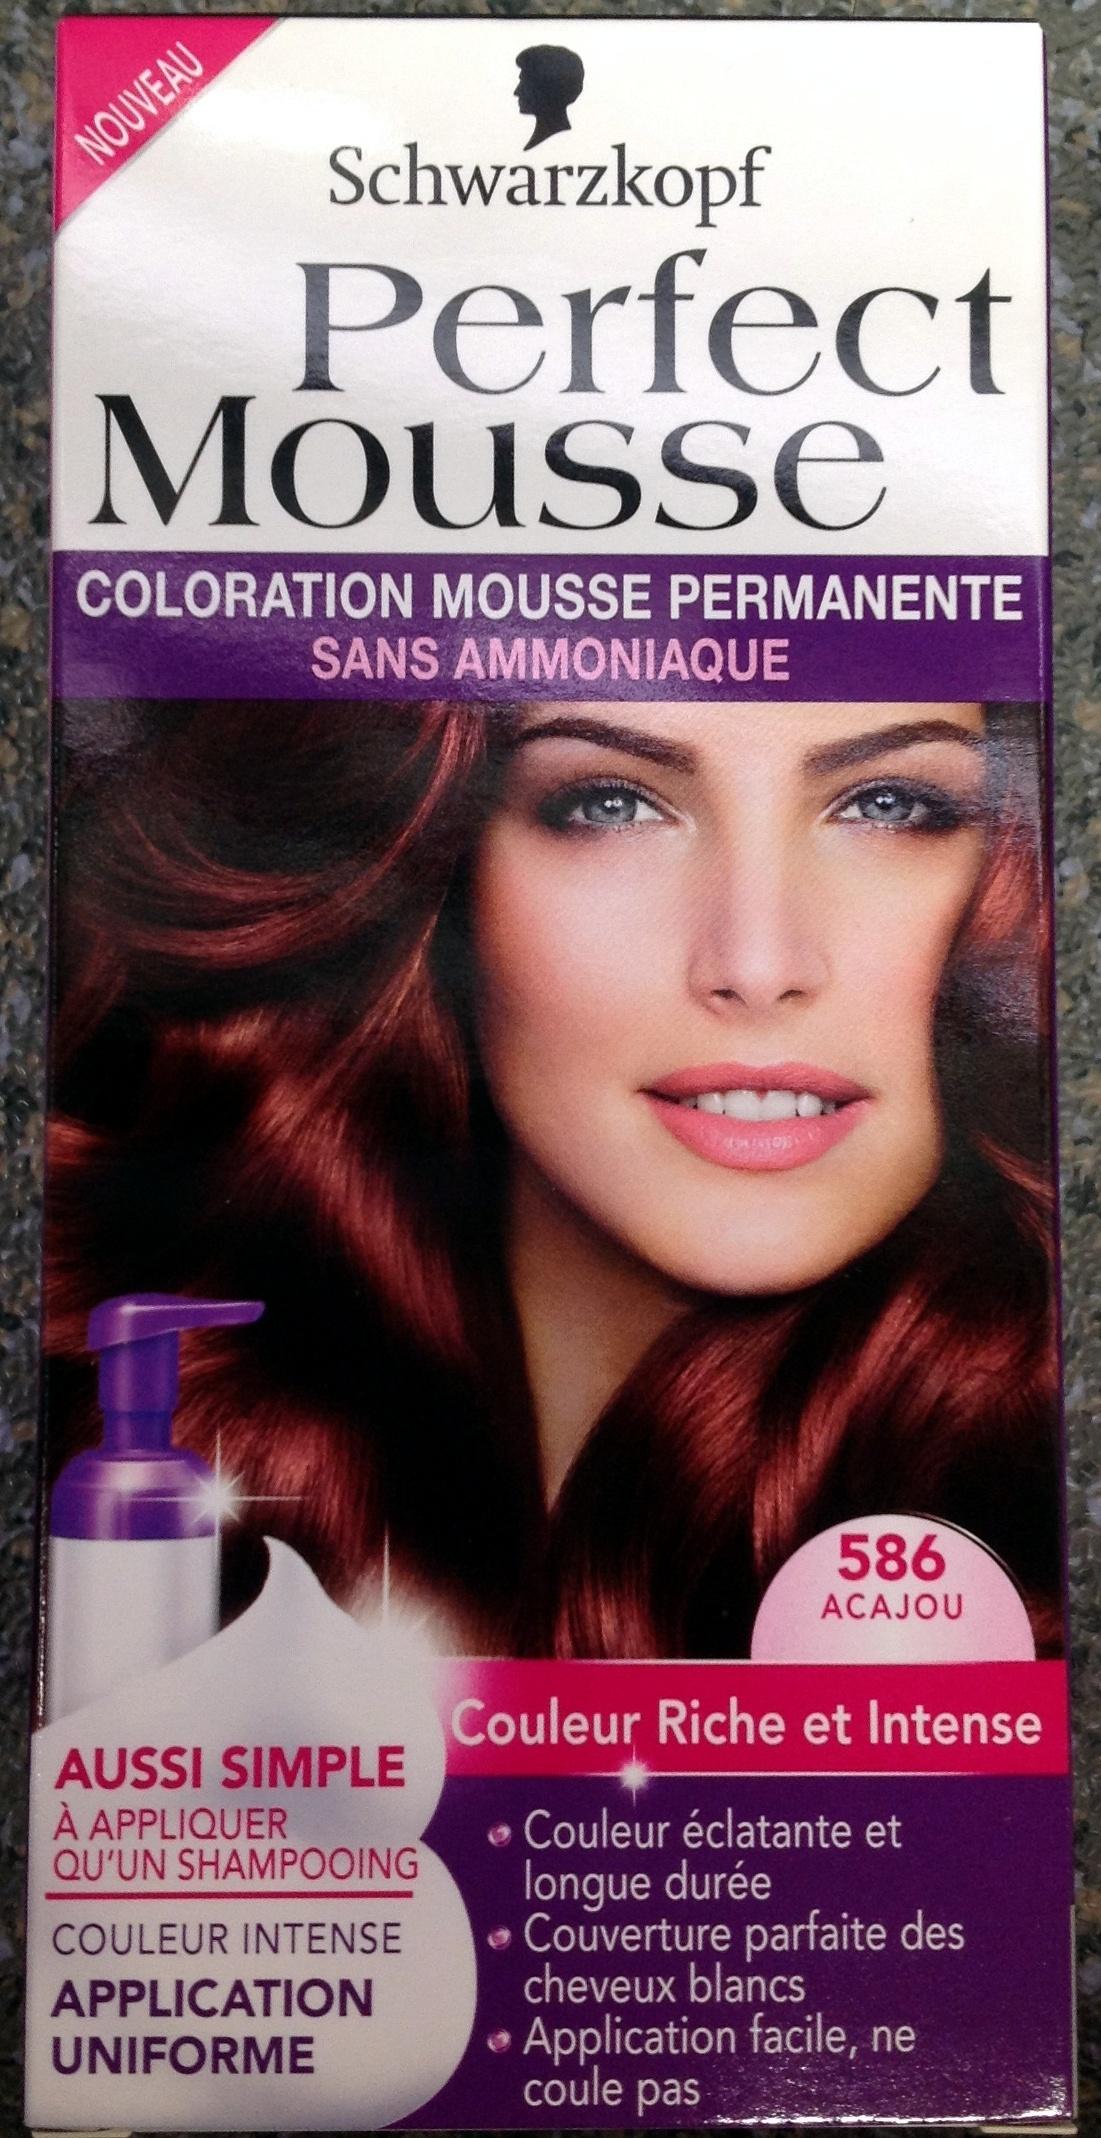 Perfect Mousse Acajou 586 - Product